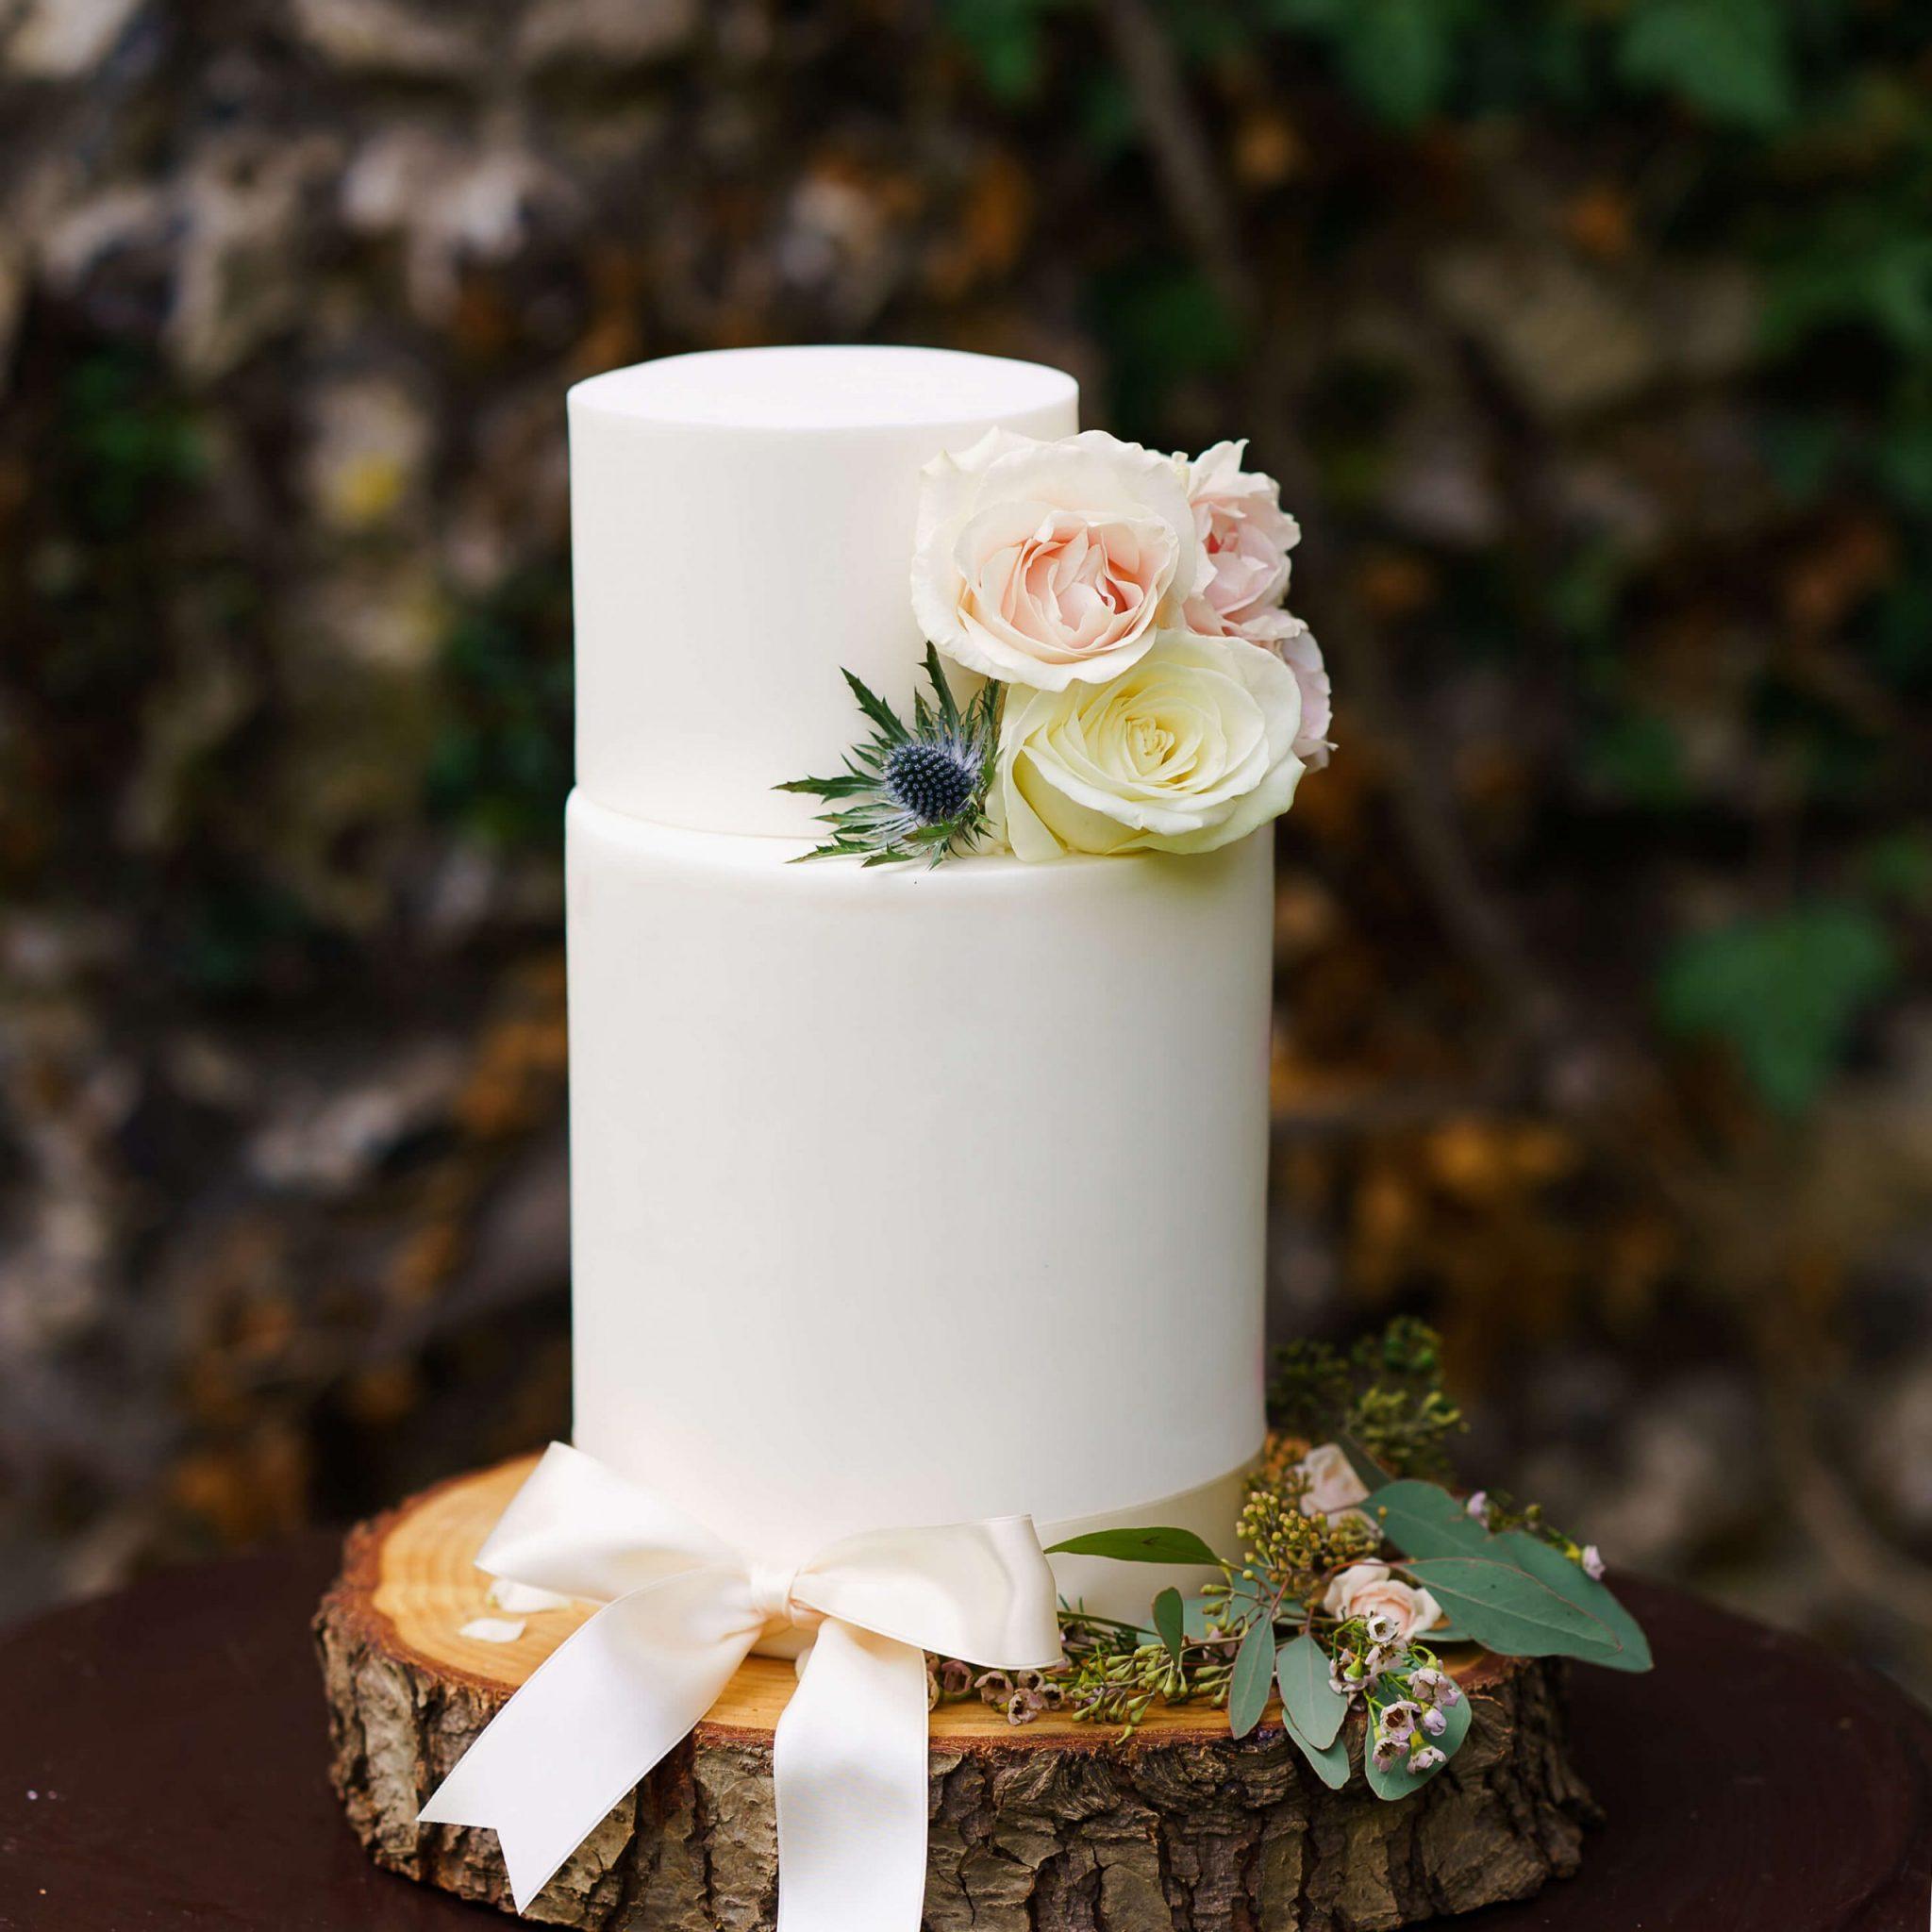 Simple Wedding Cake Design - Water Garden Weddings Winchester - Love from Lila